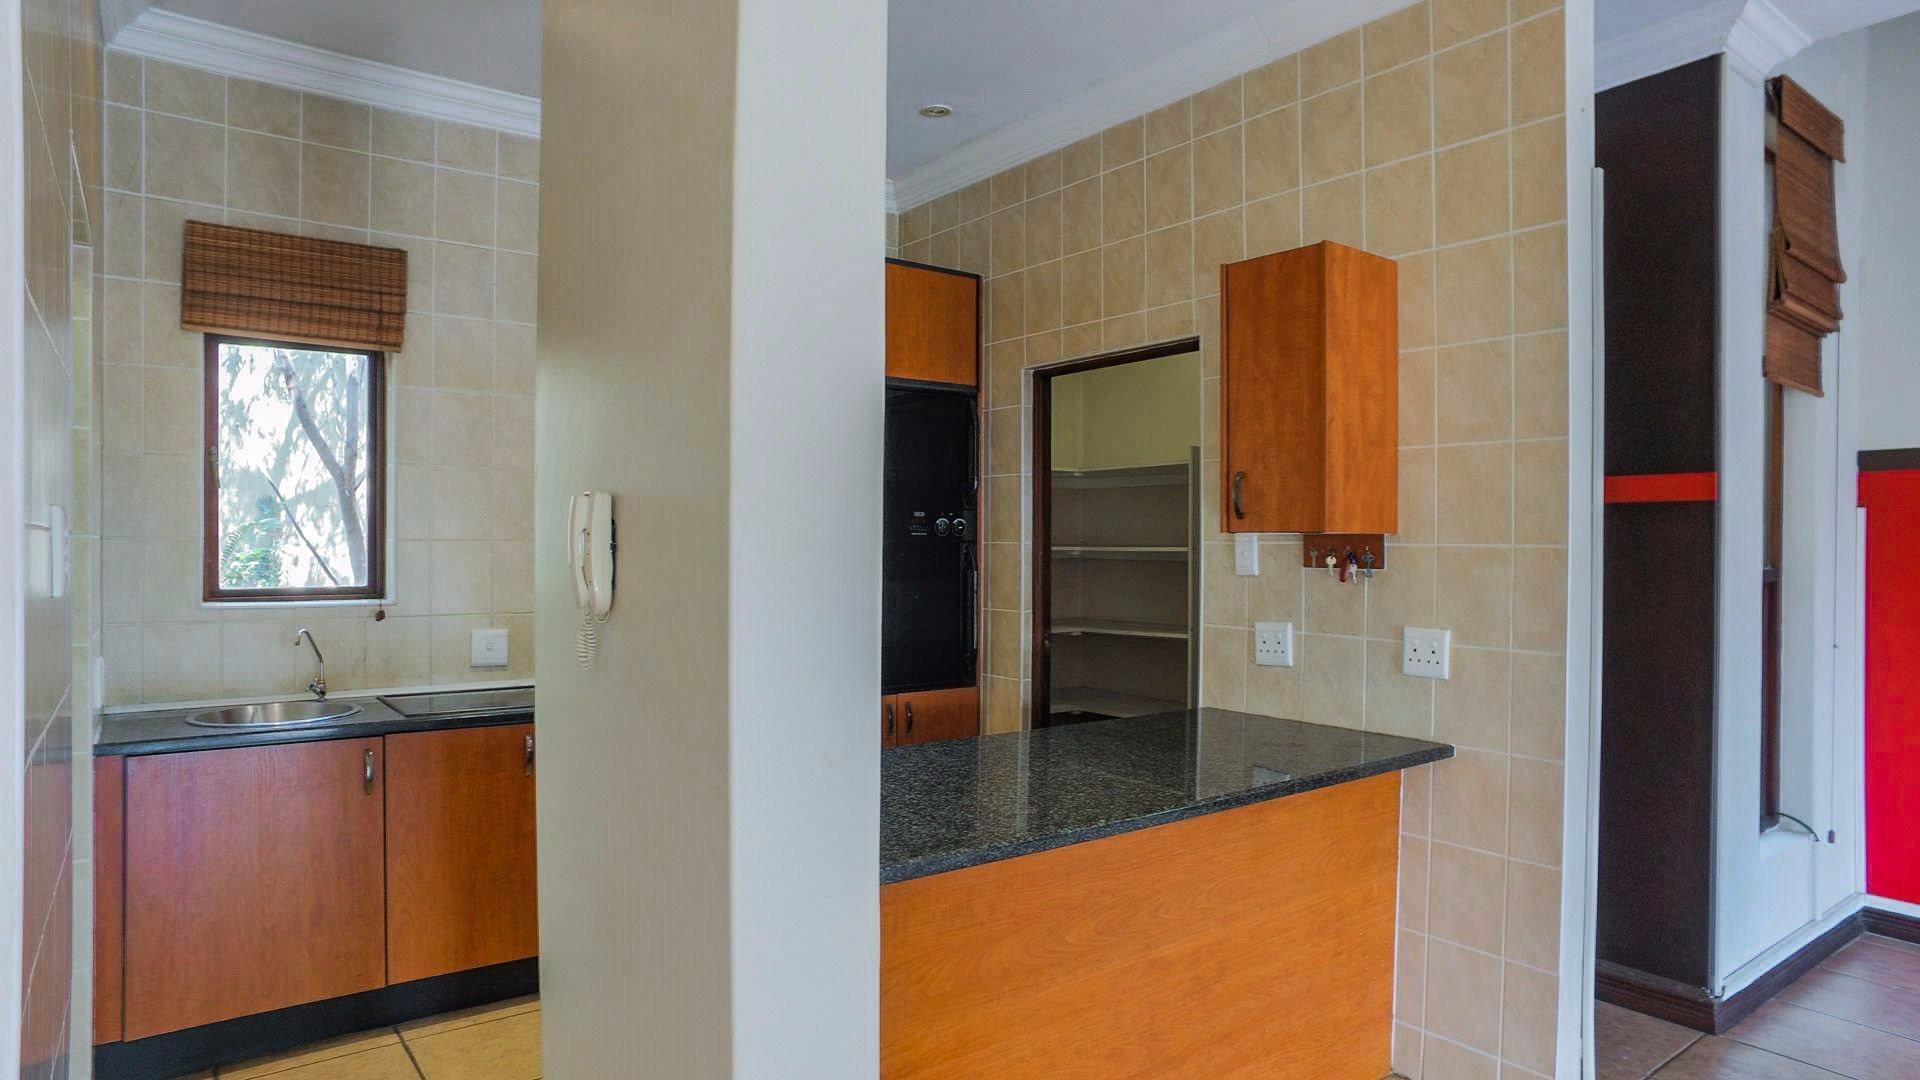 Irene View Estate property for sale. Ref No: 13519995. Picture no 16